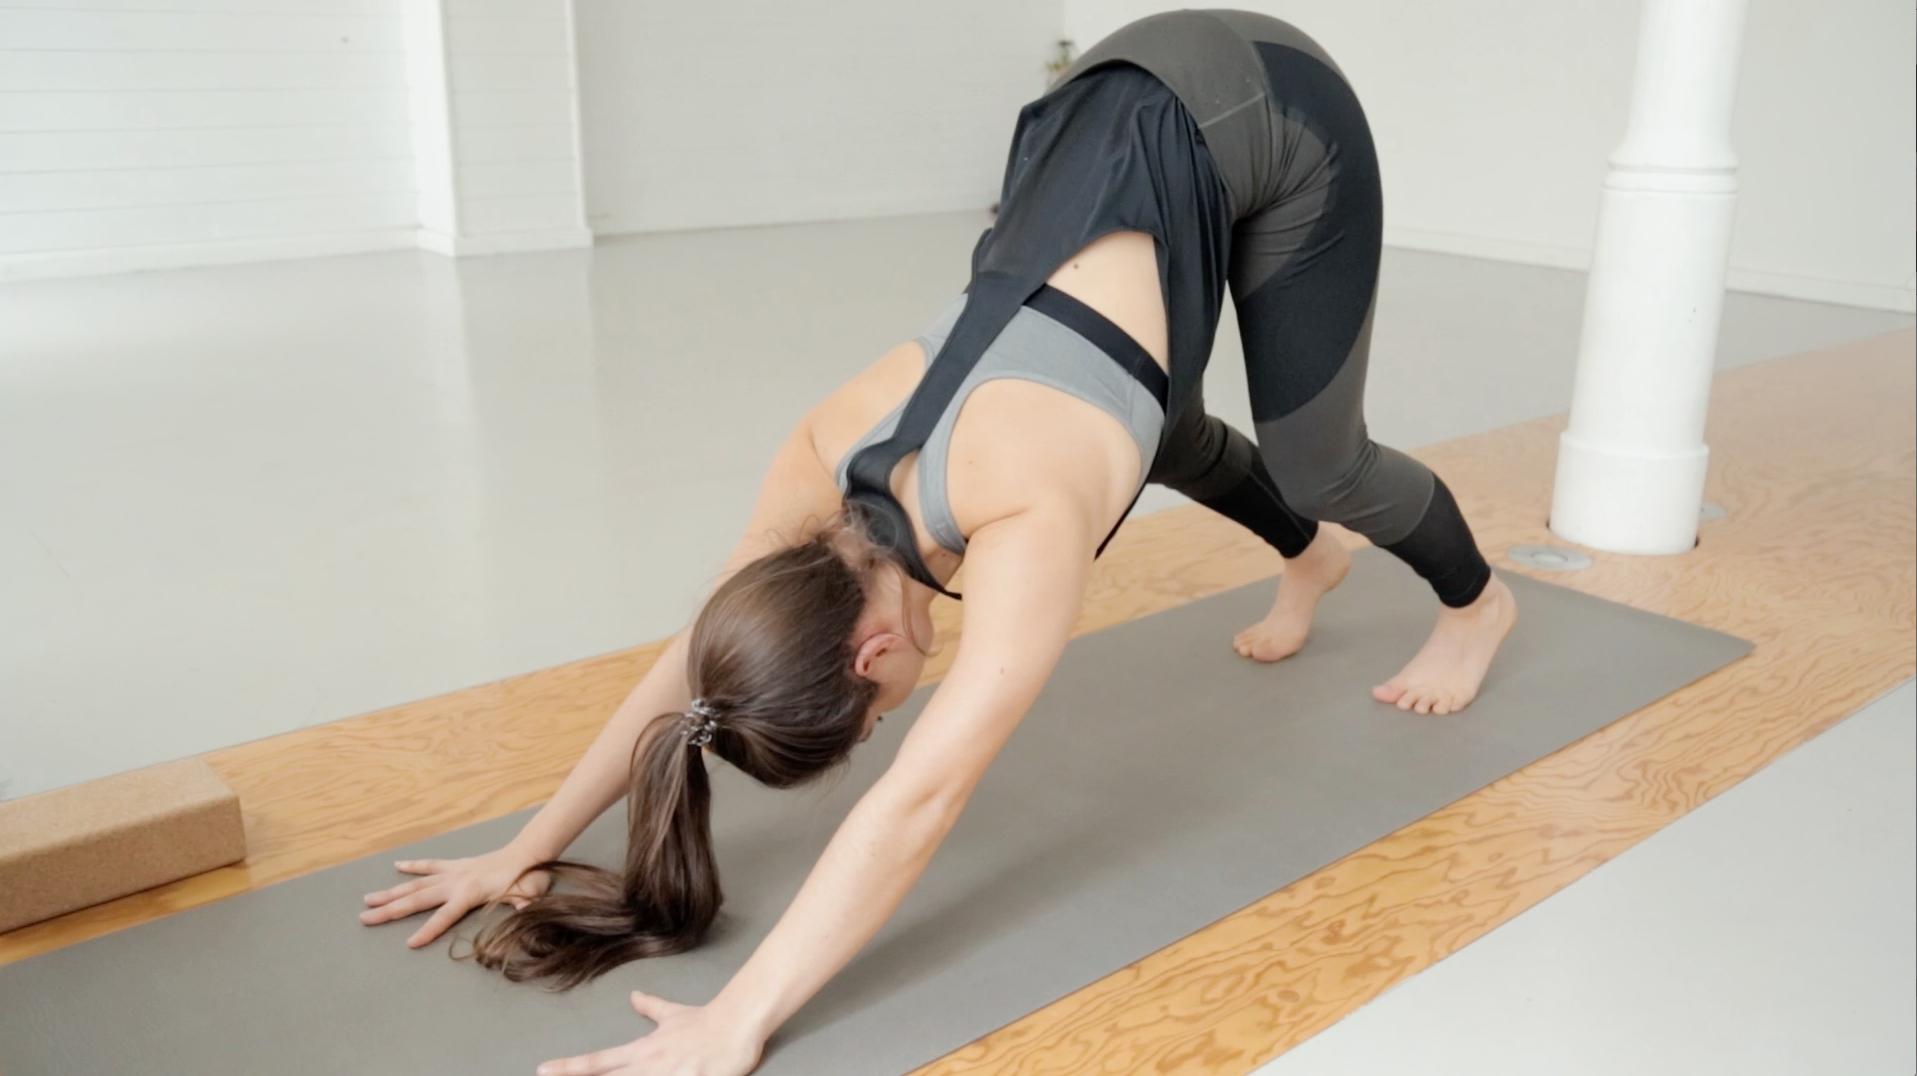 beine-po-booty-yoga-mady-morrison-06